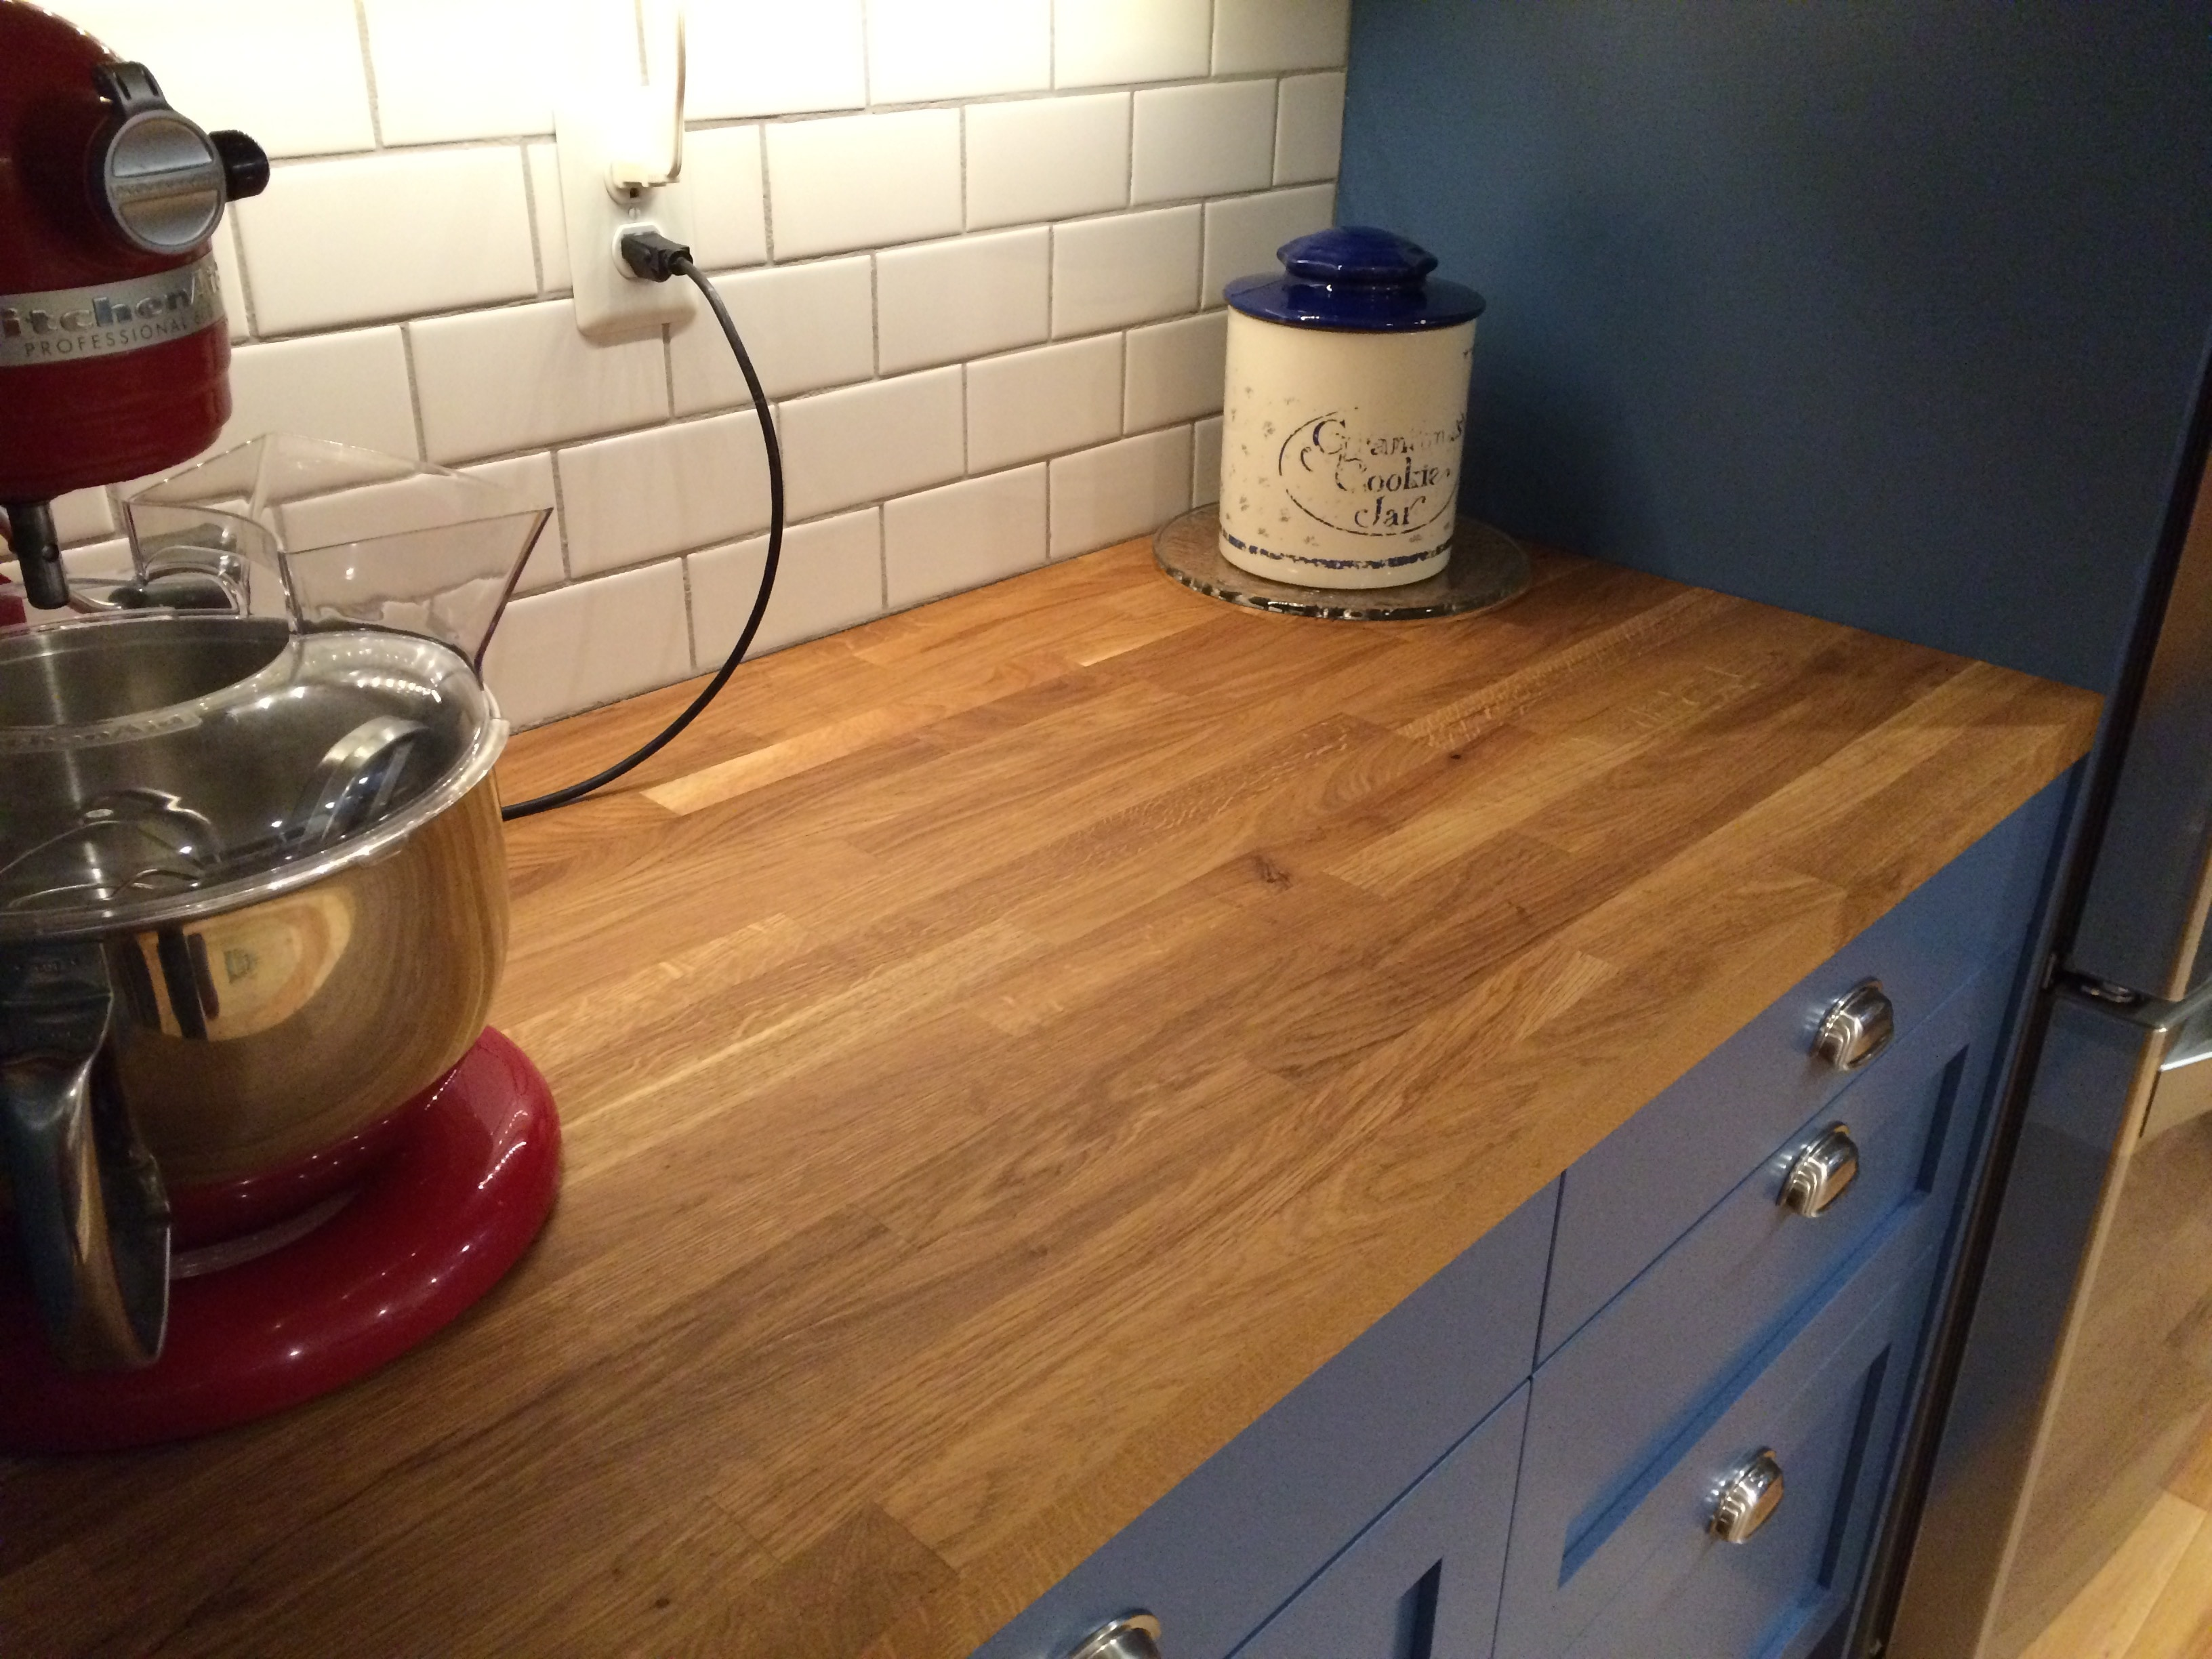 ikea countertops countertop alluring oak walnut island fabulous fresh enchanting karlby about kitchen your block furniture butcher for of